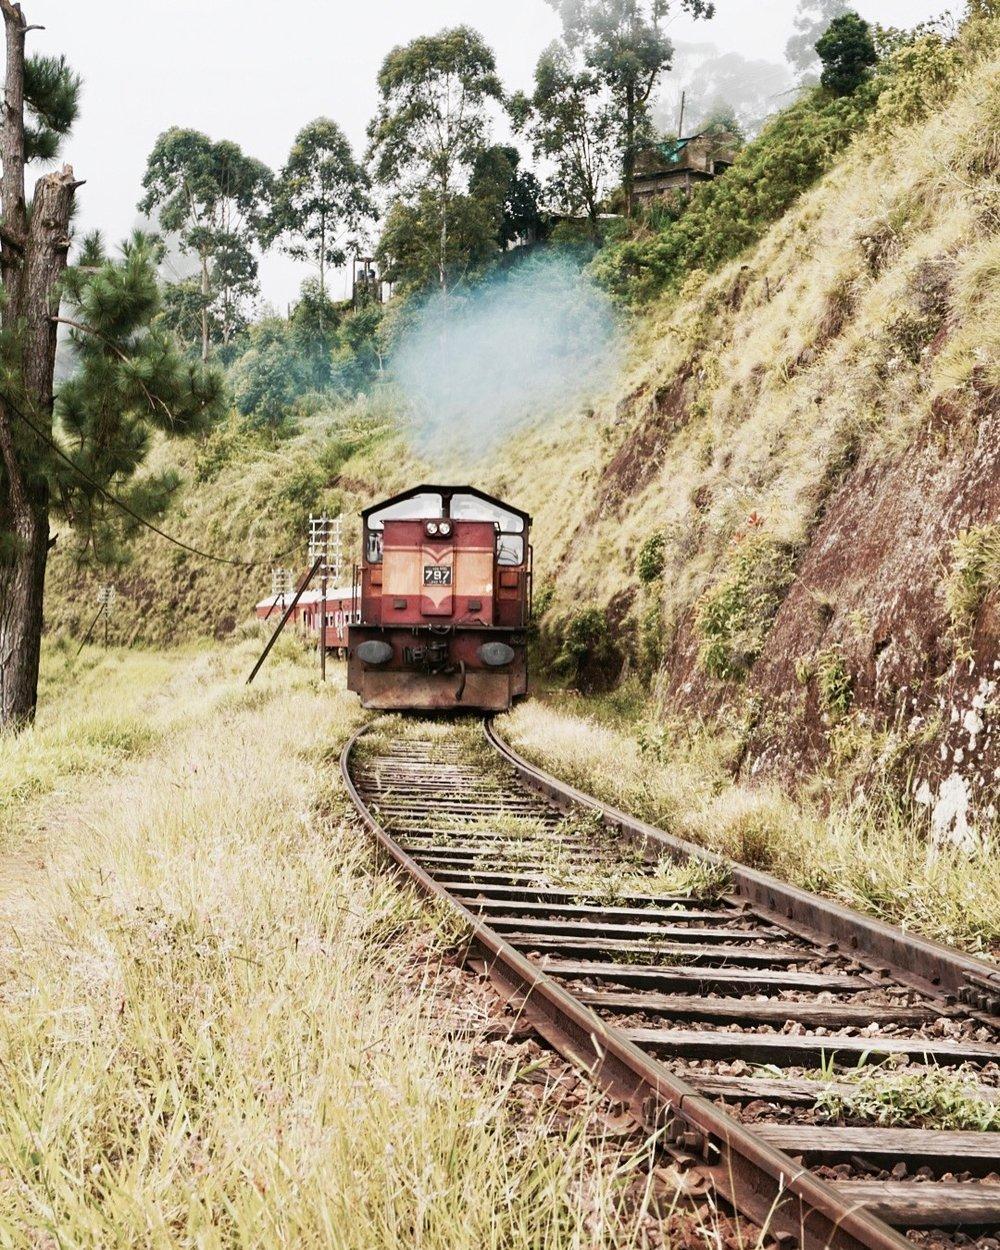 Kandy to Ella train ride in Sri Lanka